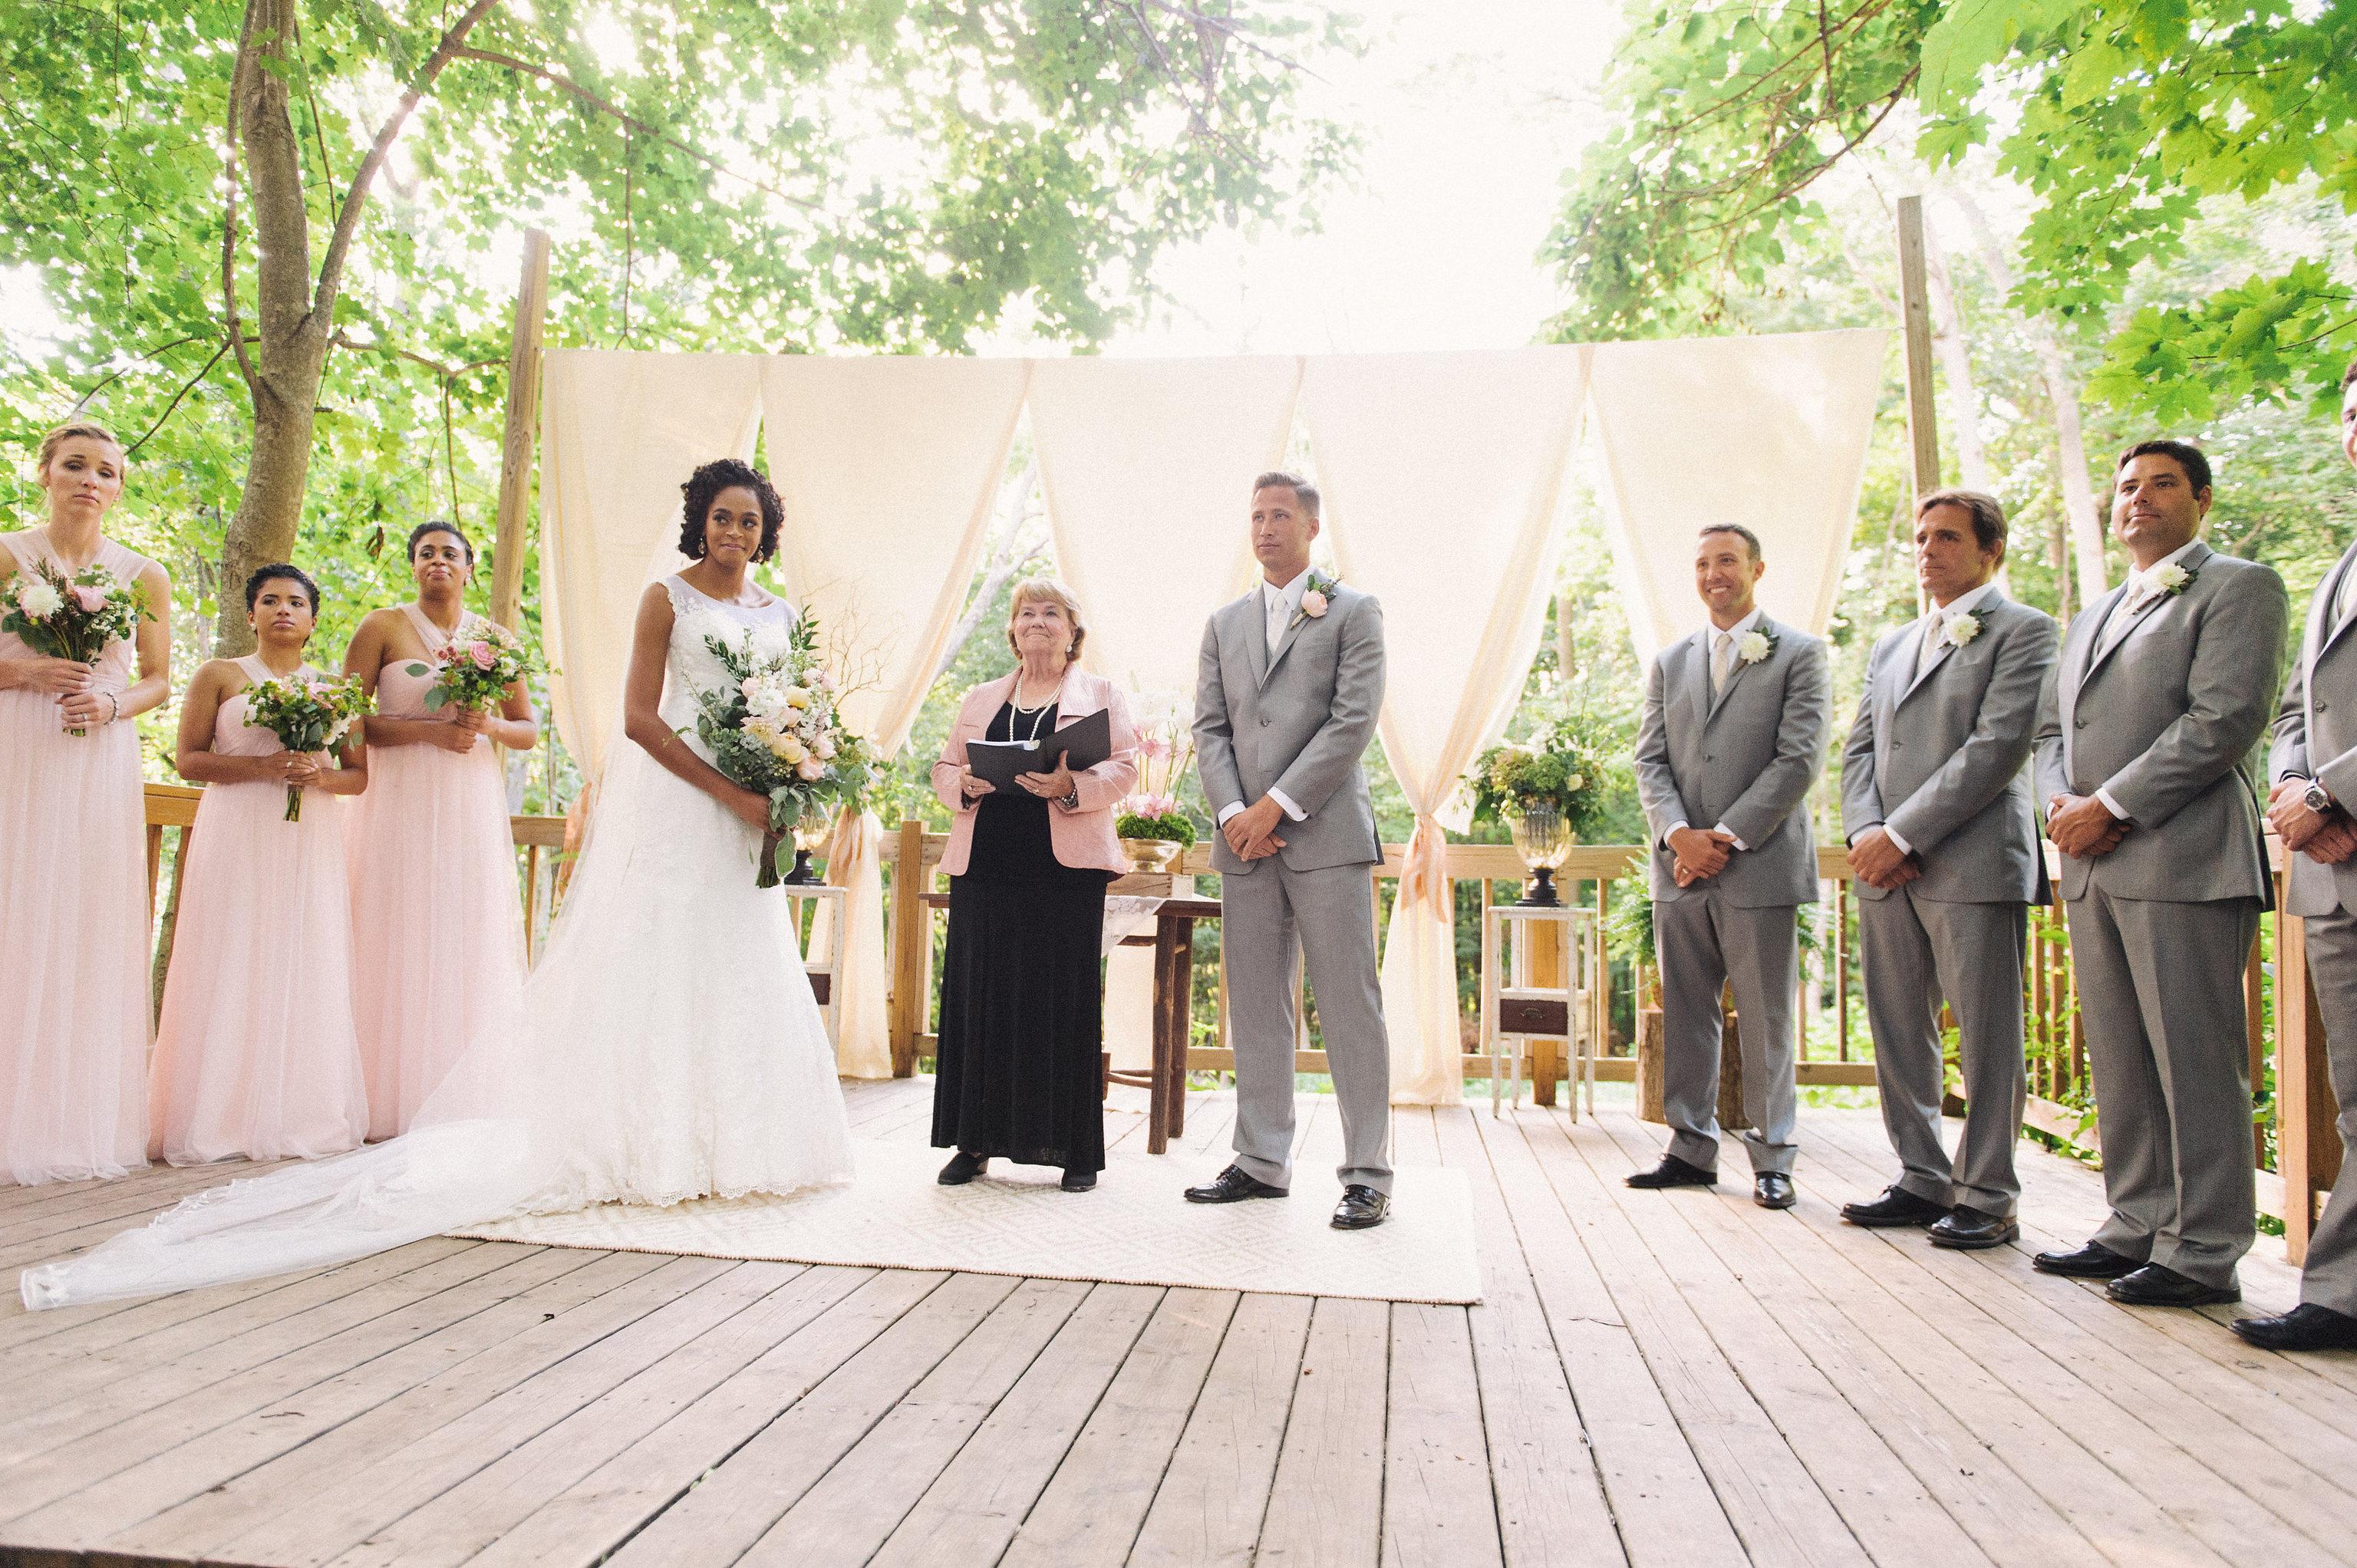 August 2015 wedding rental